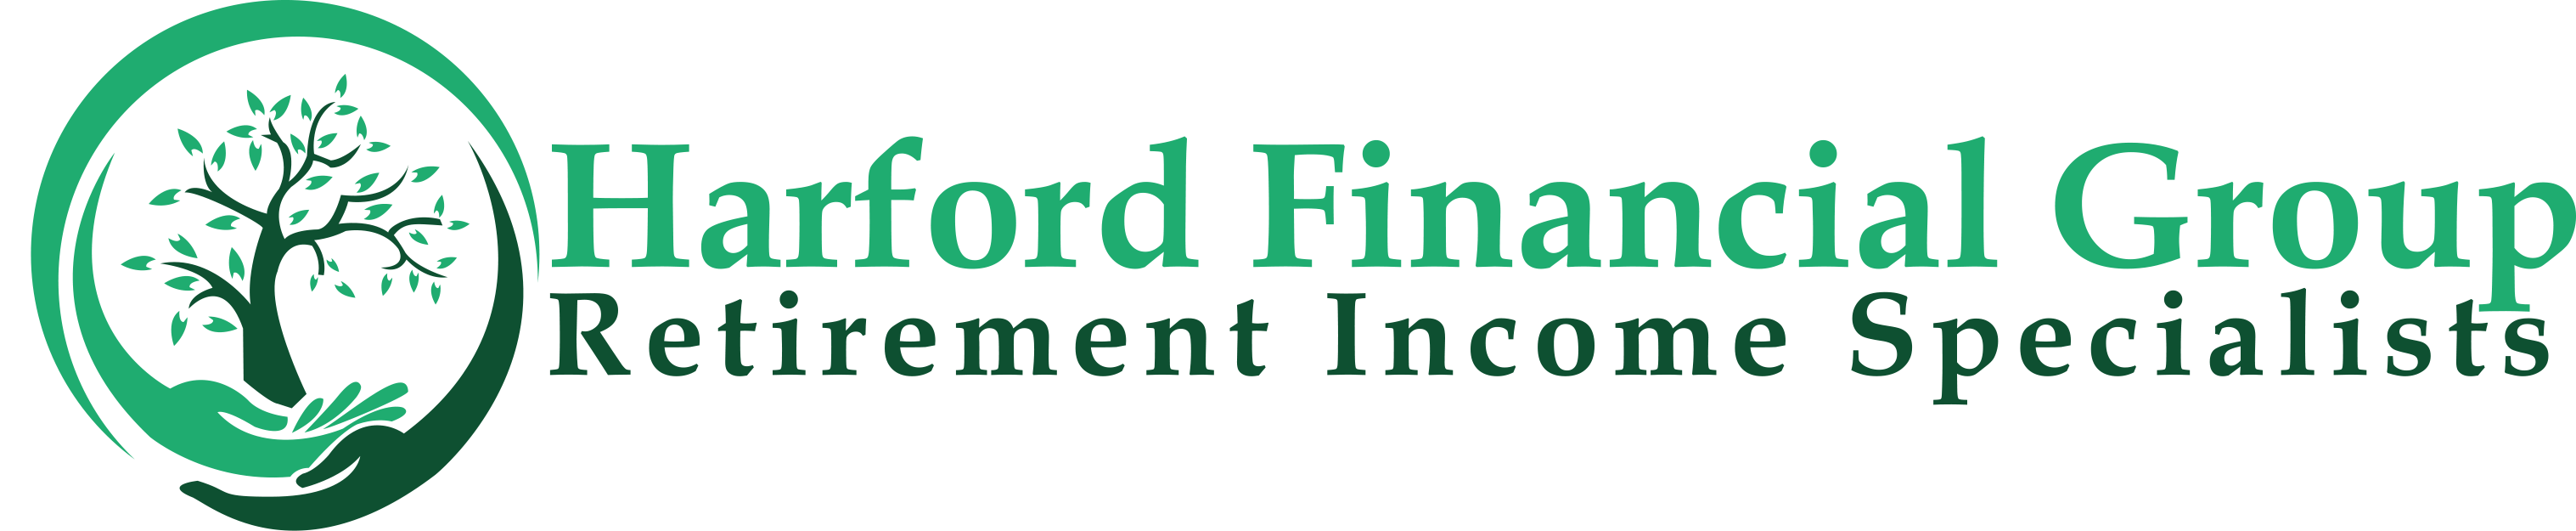 Harford Financial Group - Bel Air, MD